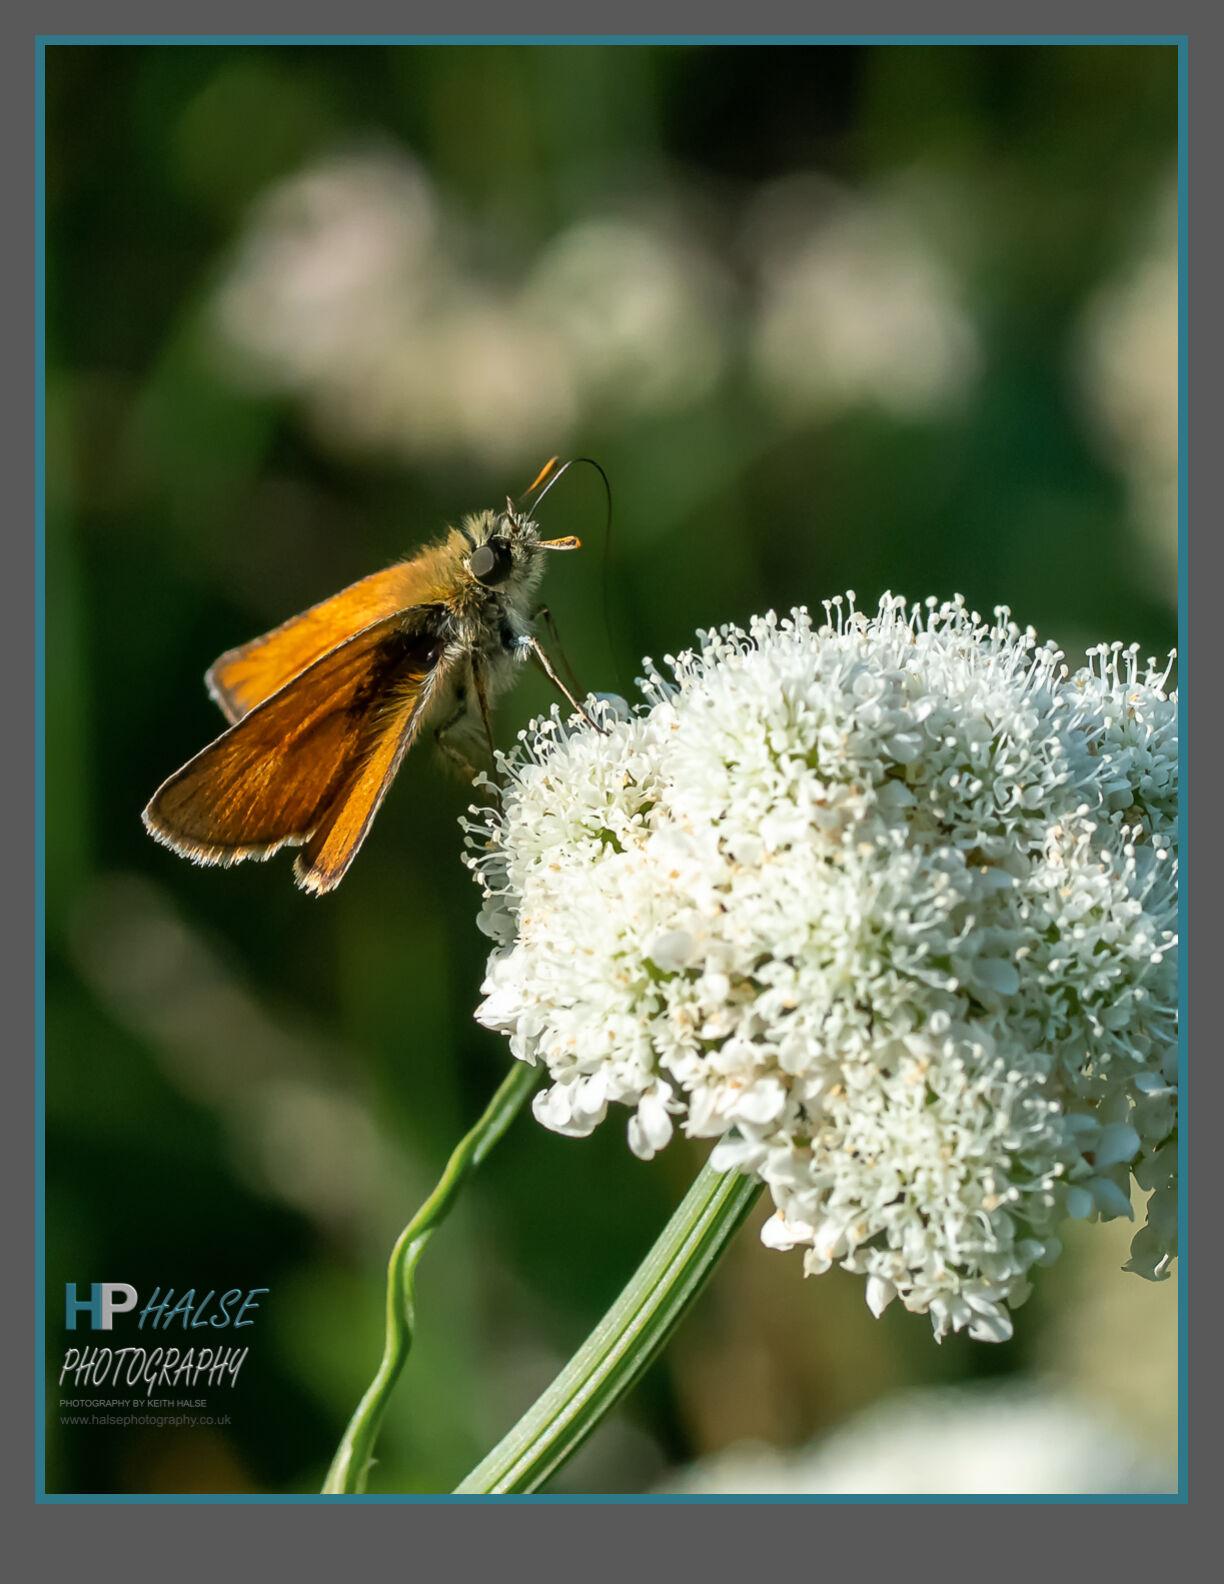 002 Lulworth Skipper Butterfly